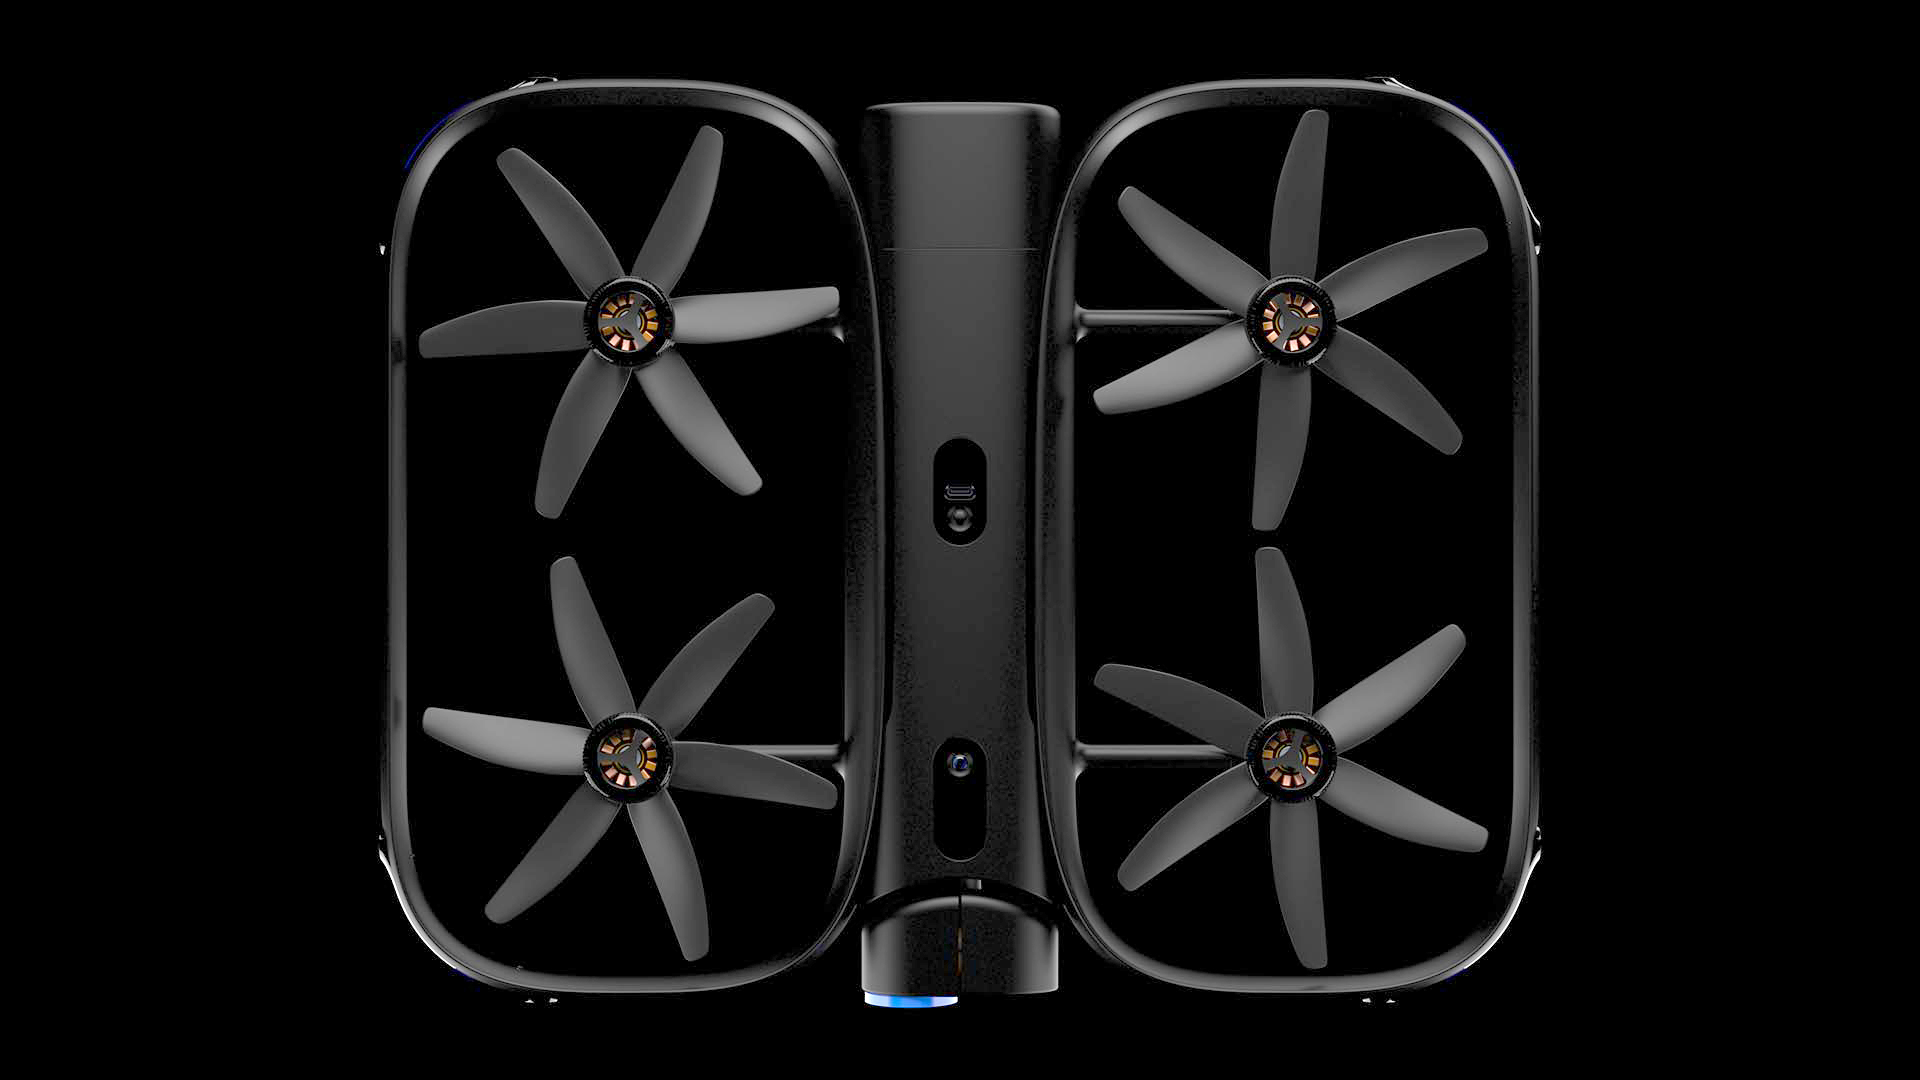 Skydio R1 - 4K撮影可能な次世代の自立型ドローン